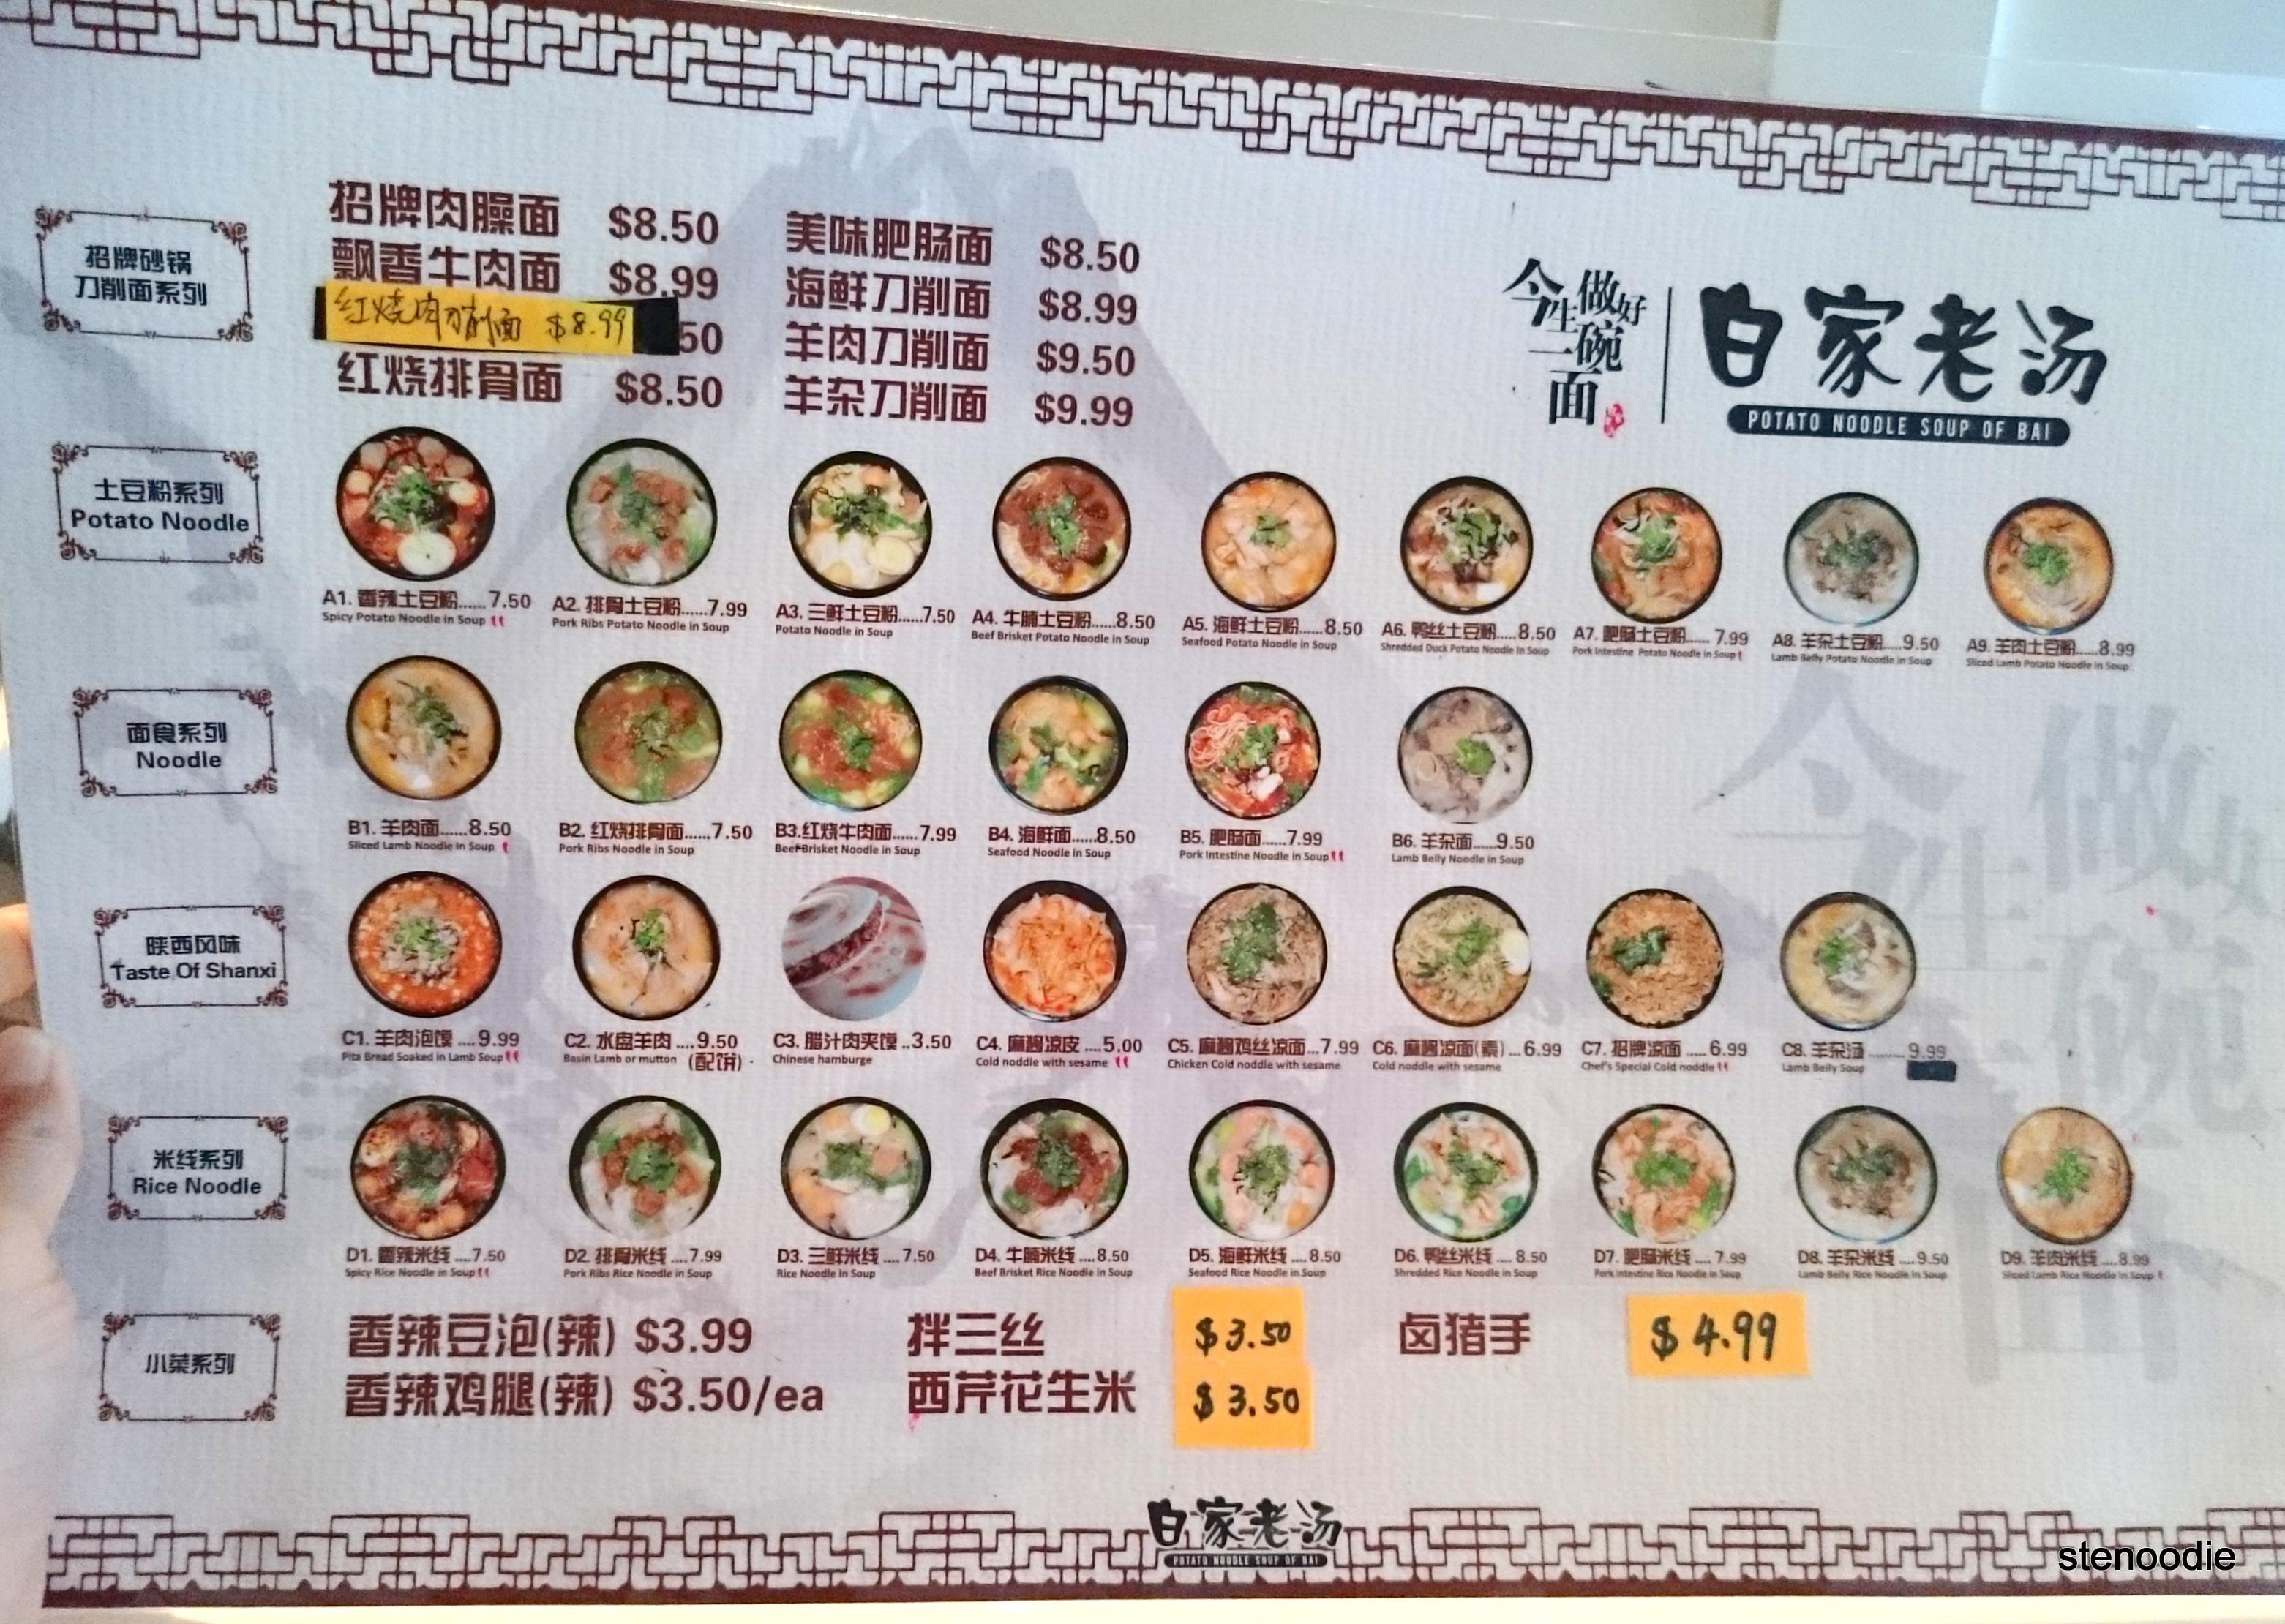 Potato Noodle Soup of Bai menu and prices